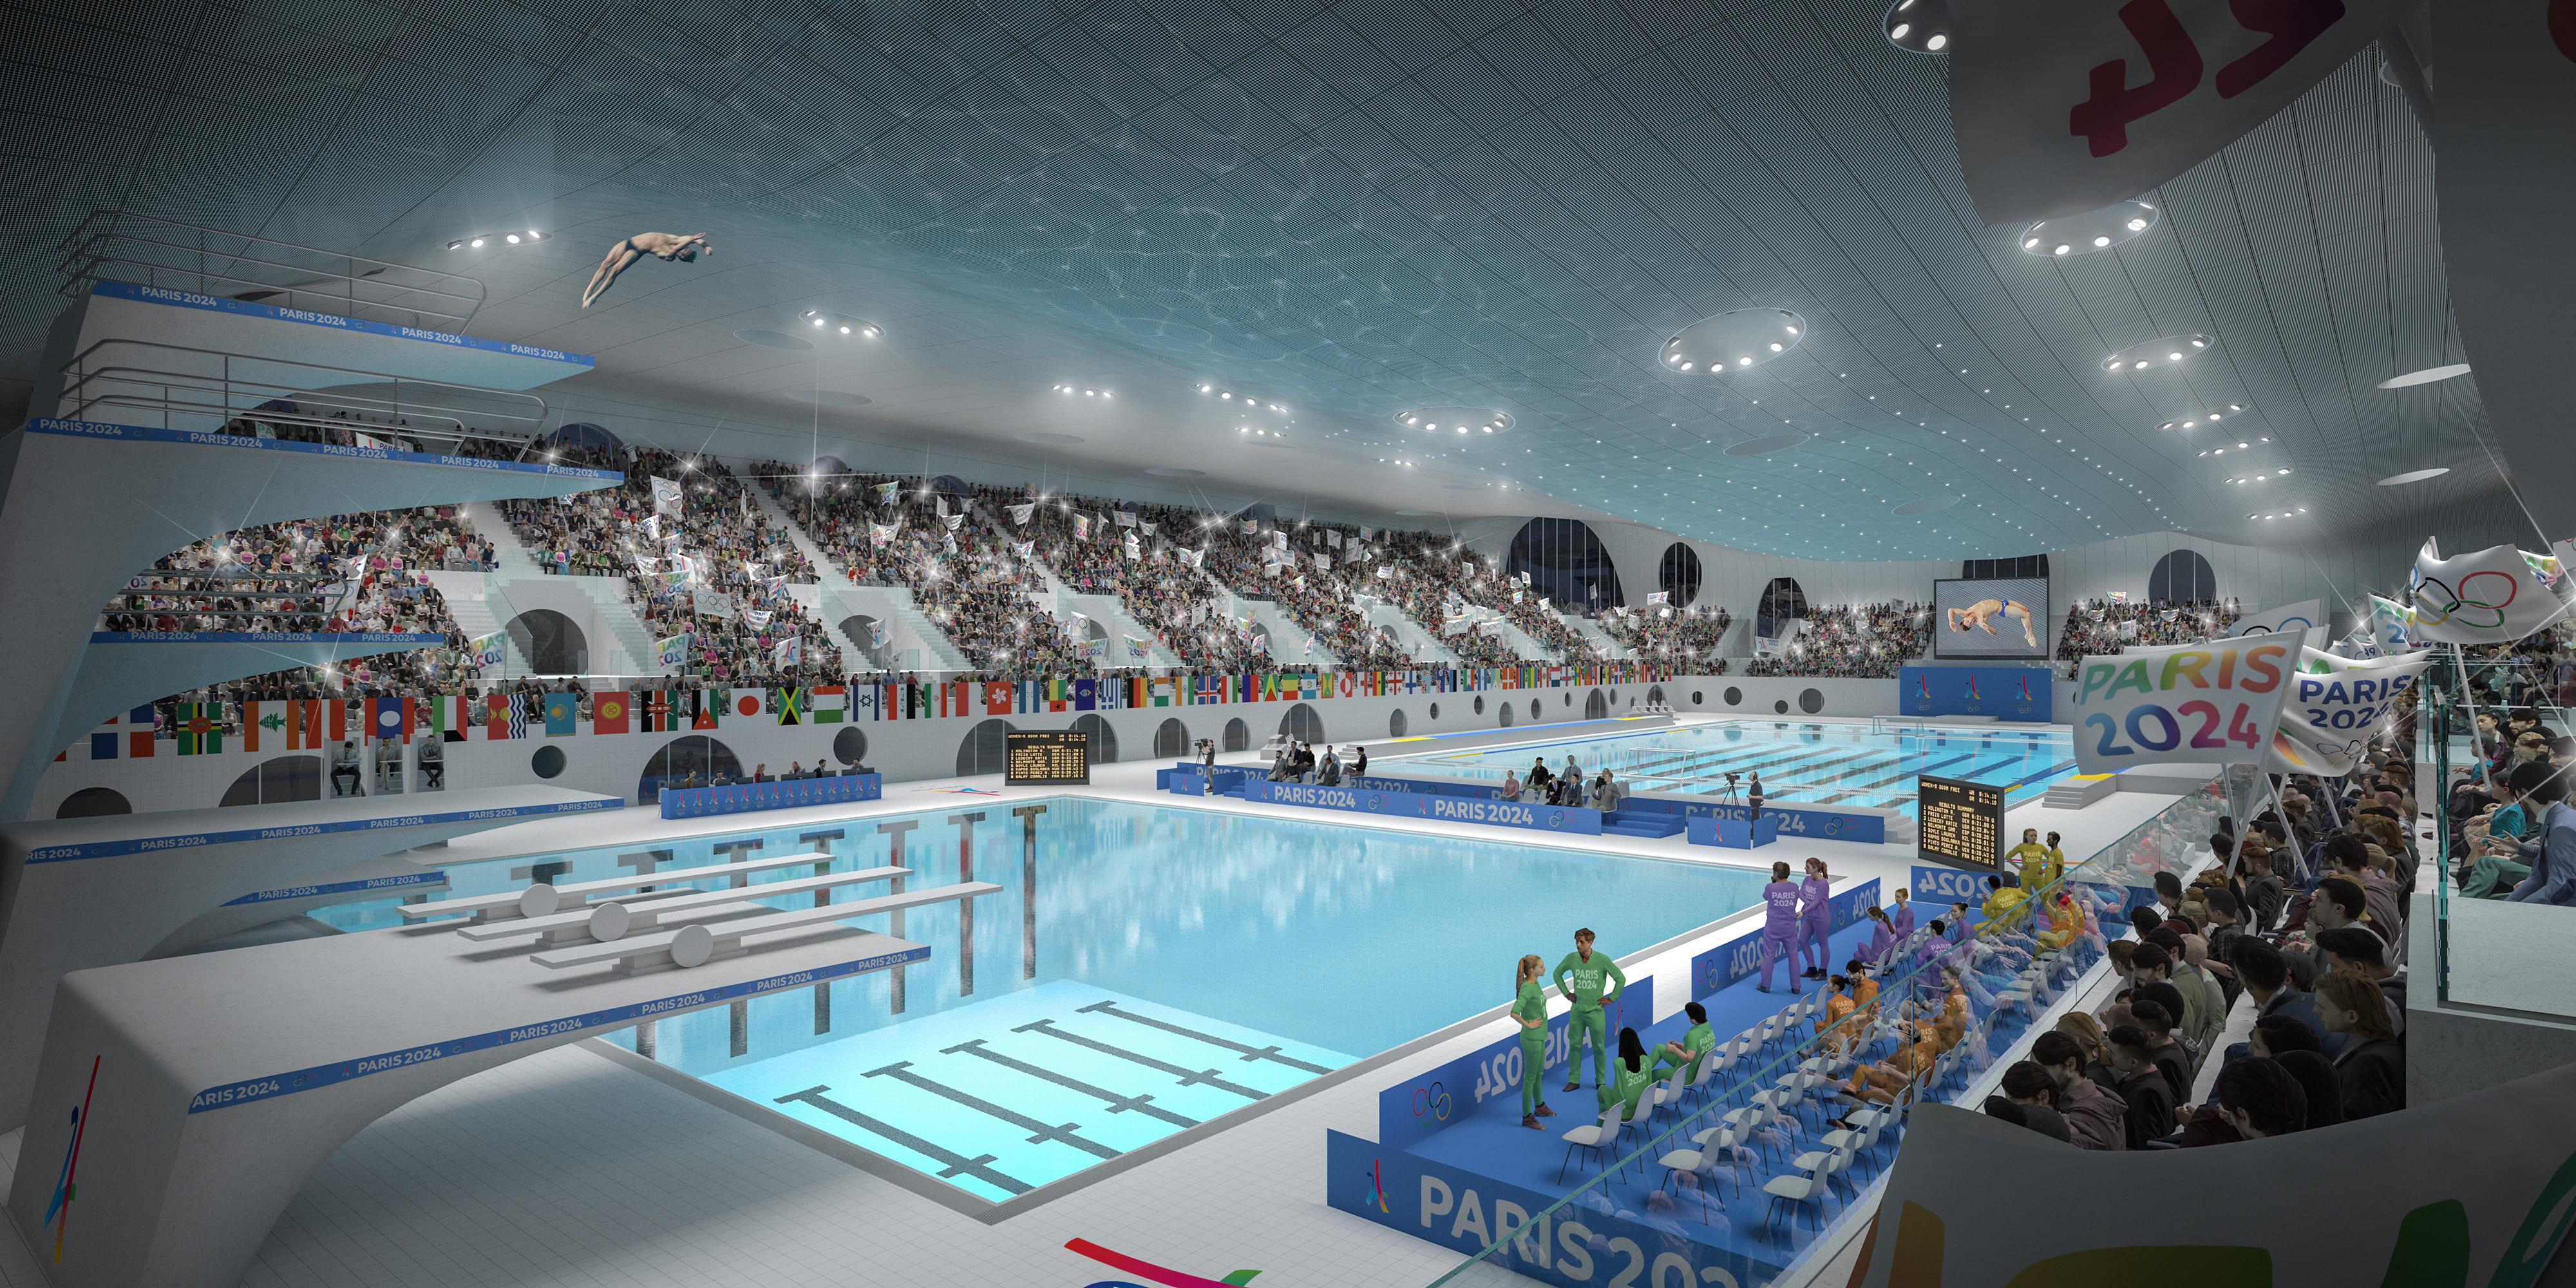 https://www.amc-archi.com/mediatheque/9/7/8/000059879/projet-non-retenu-centre-aquatique-olympique-jo.jpg